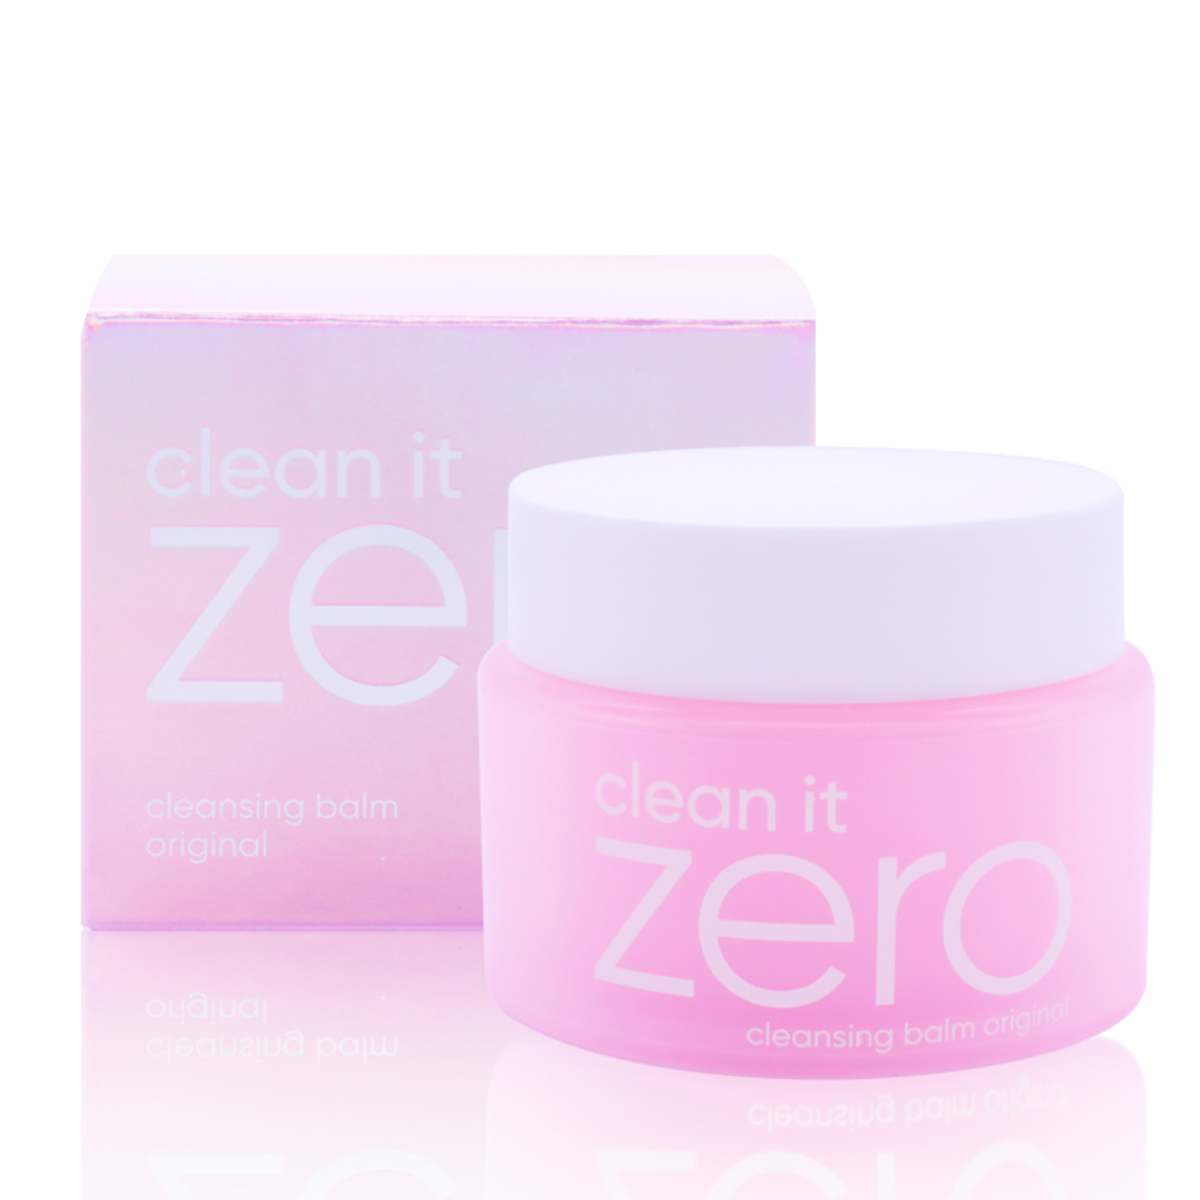 Clean it Zero Cleansing Balm Original 100ml [Parallel Import]